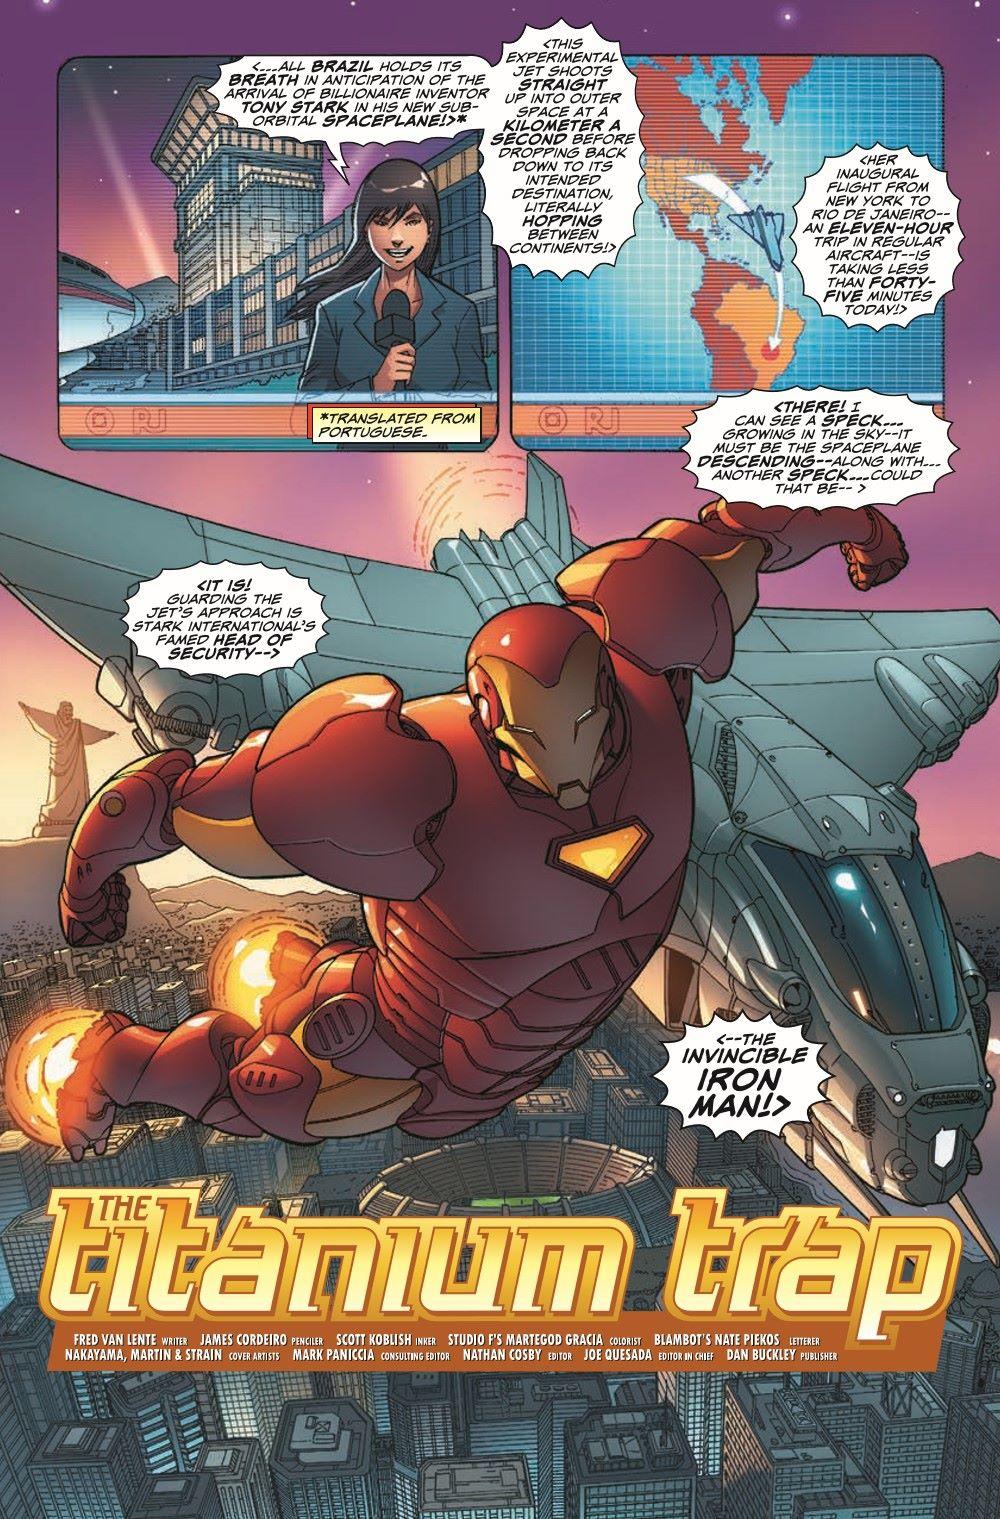 MARVELVOH_IM_pr-4 ComicList Previews: MARVEL VAULT OF HEROES IRON MAN TP